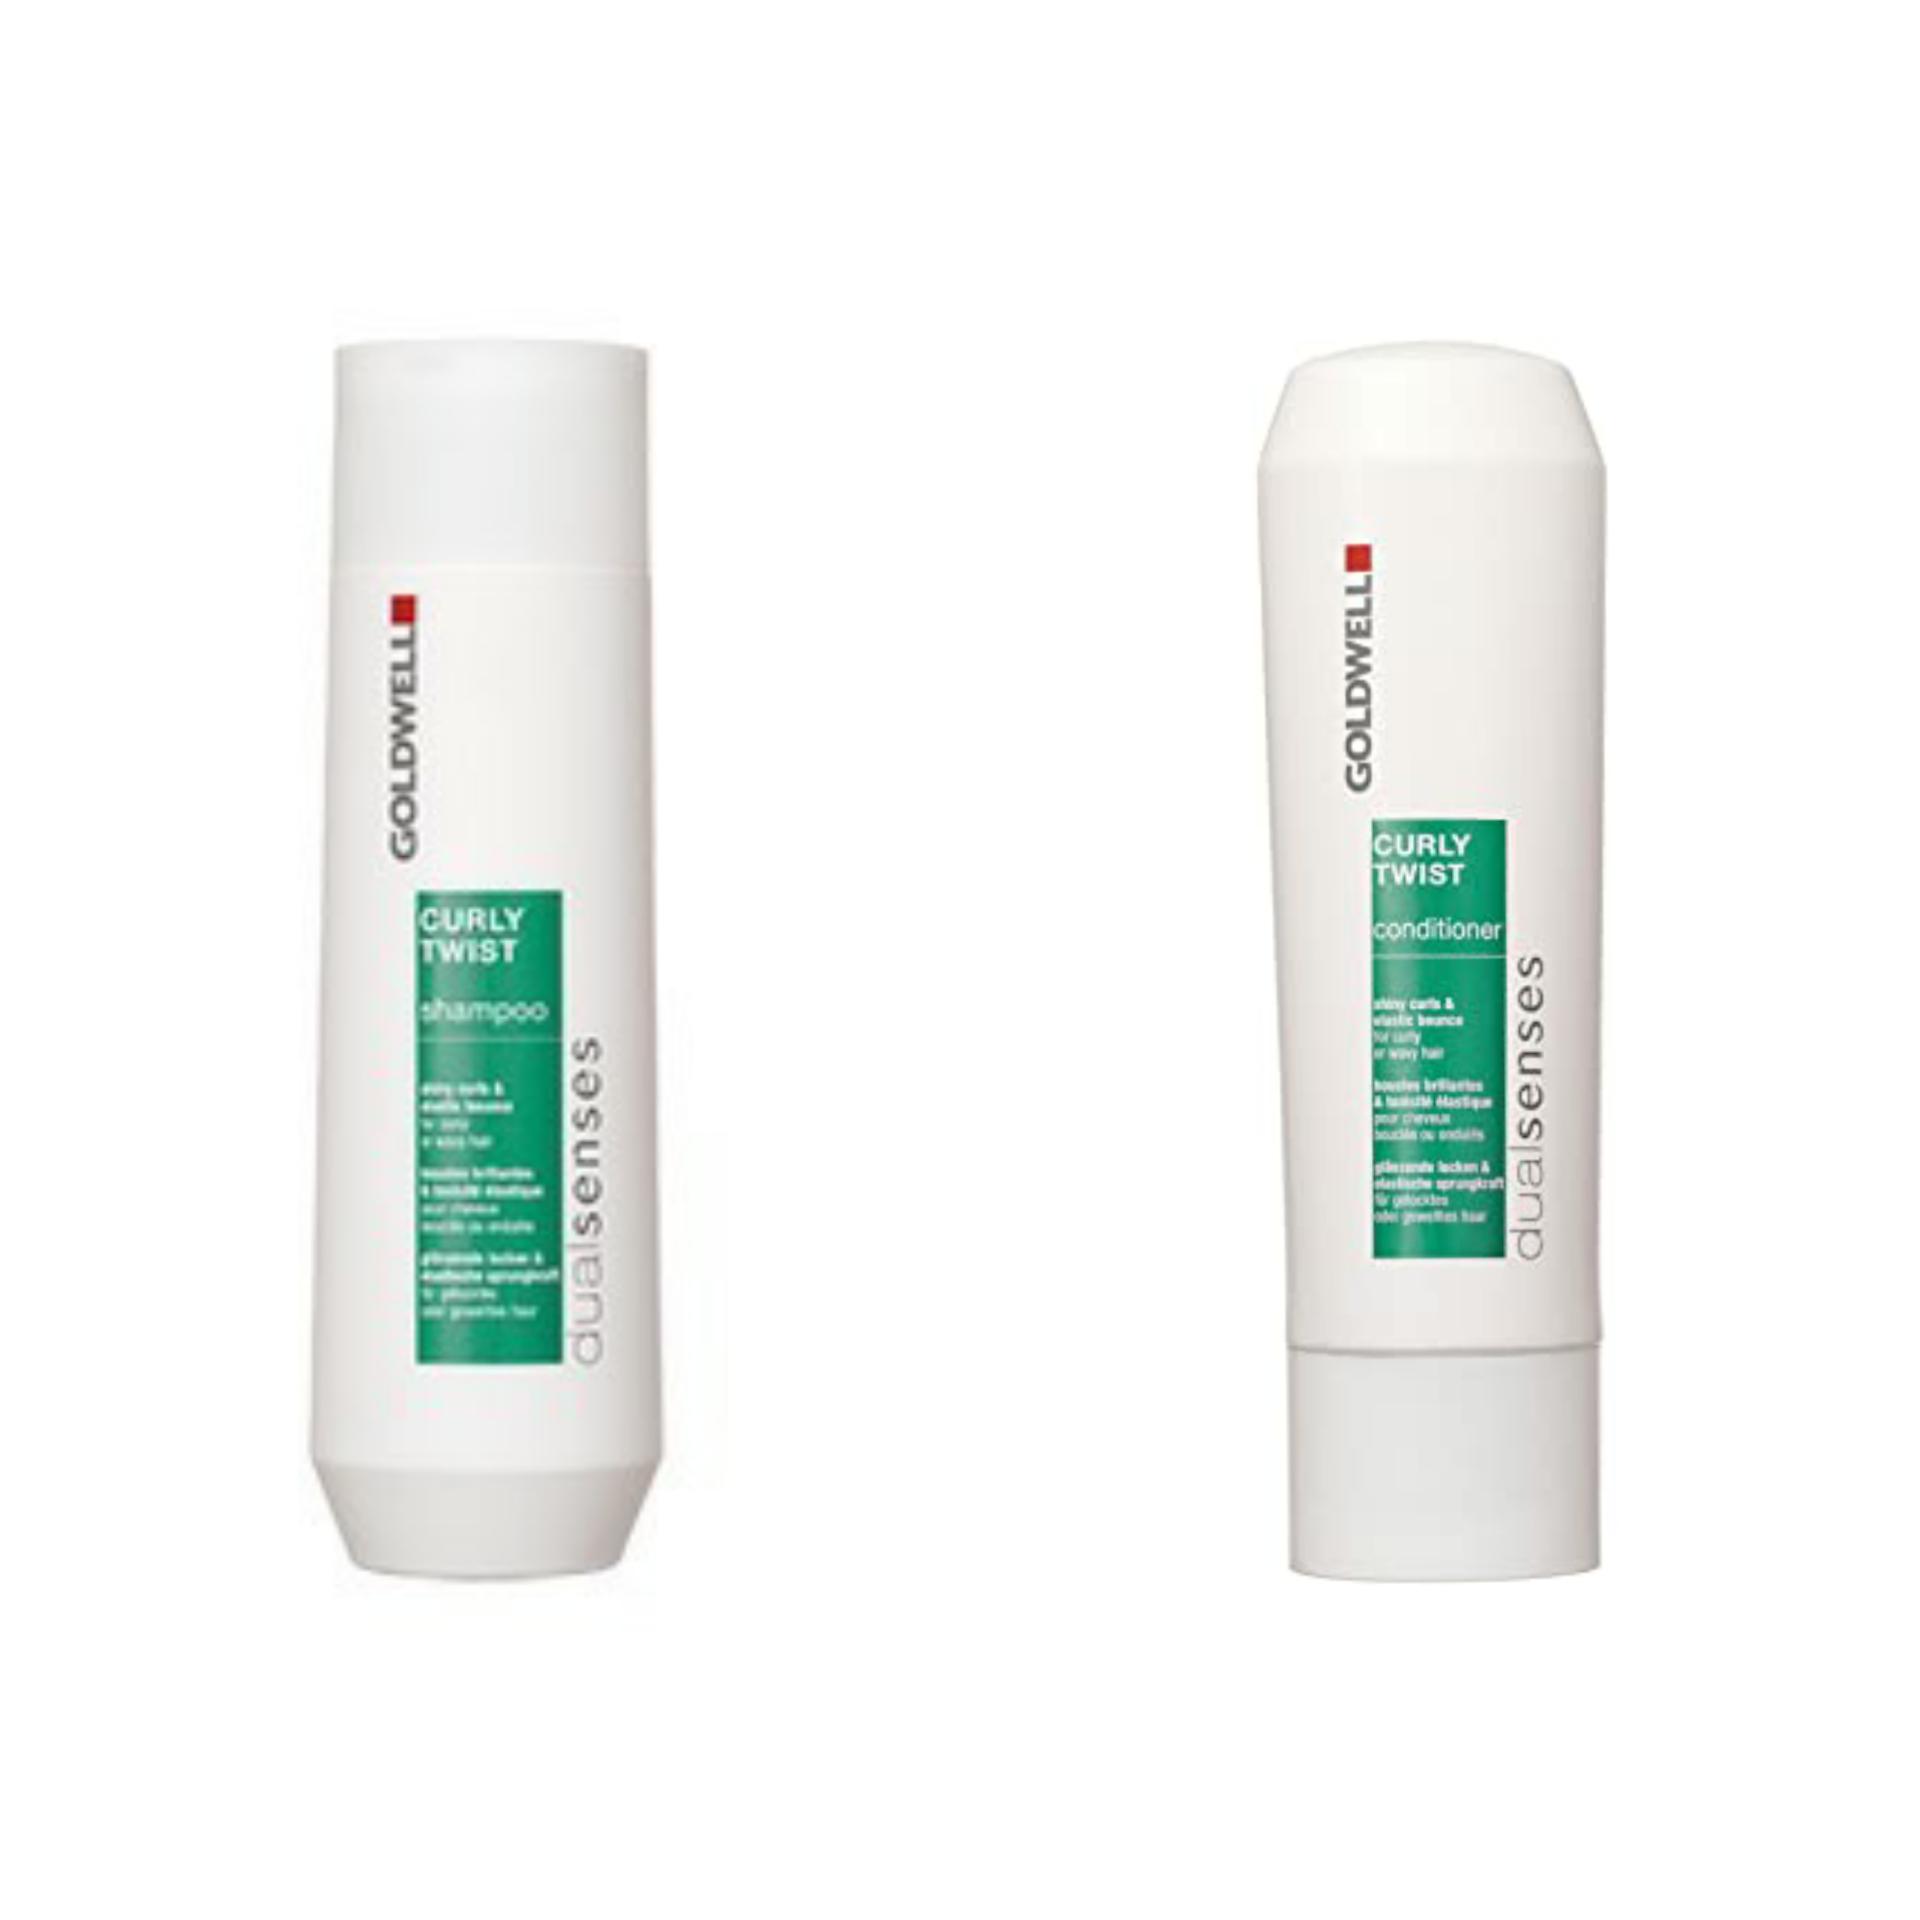 Goldwell Dualsenses Curly Twist Shampoo 250ml, Curly Twist Conditioner 200ml